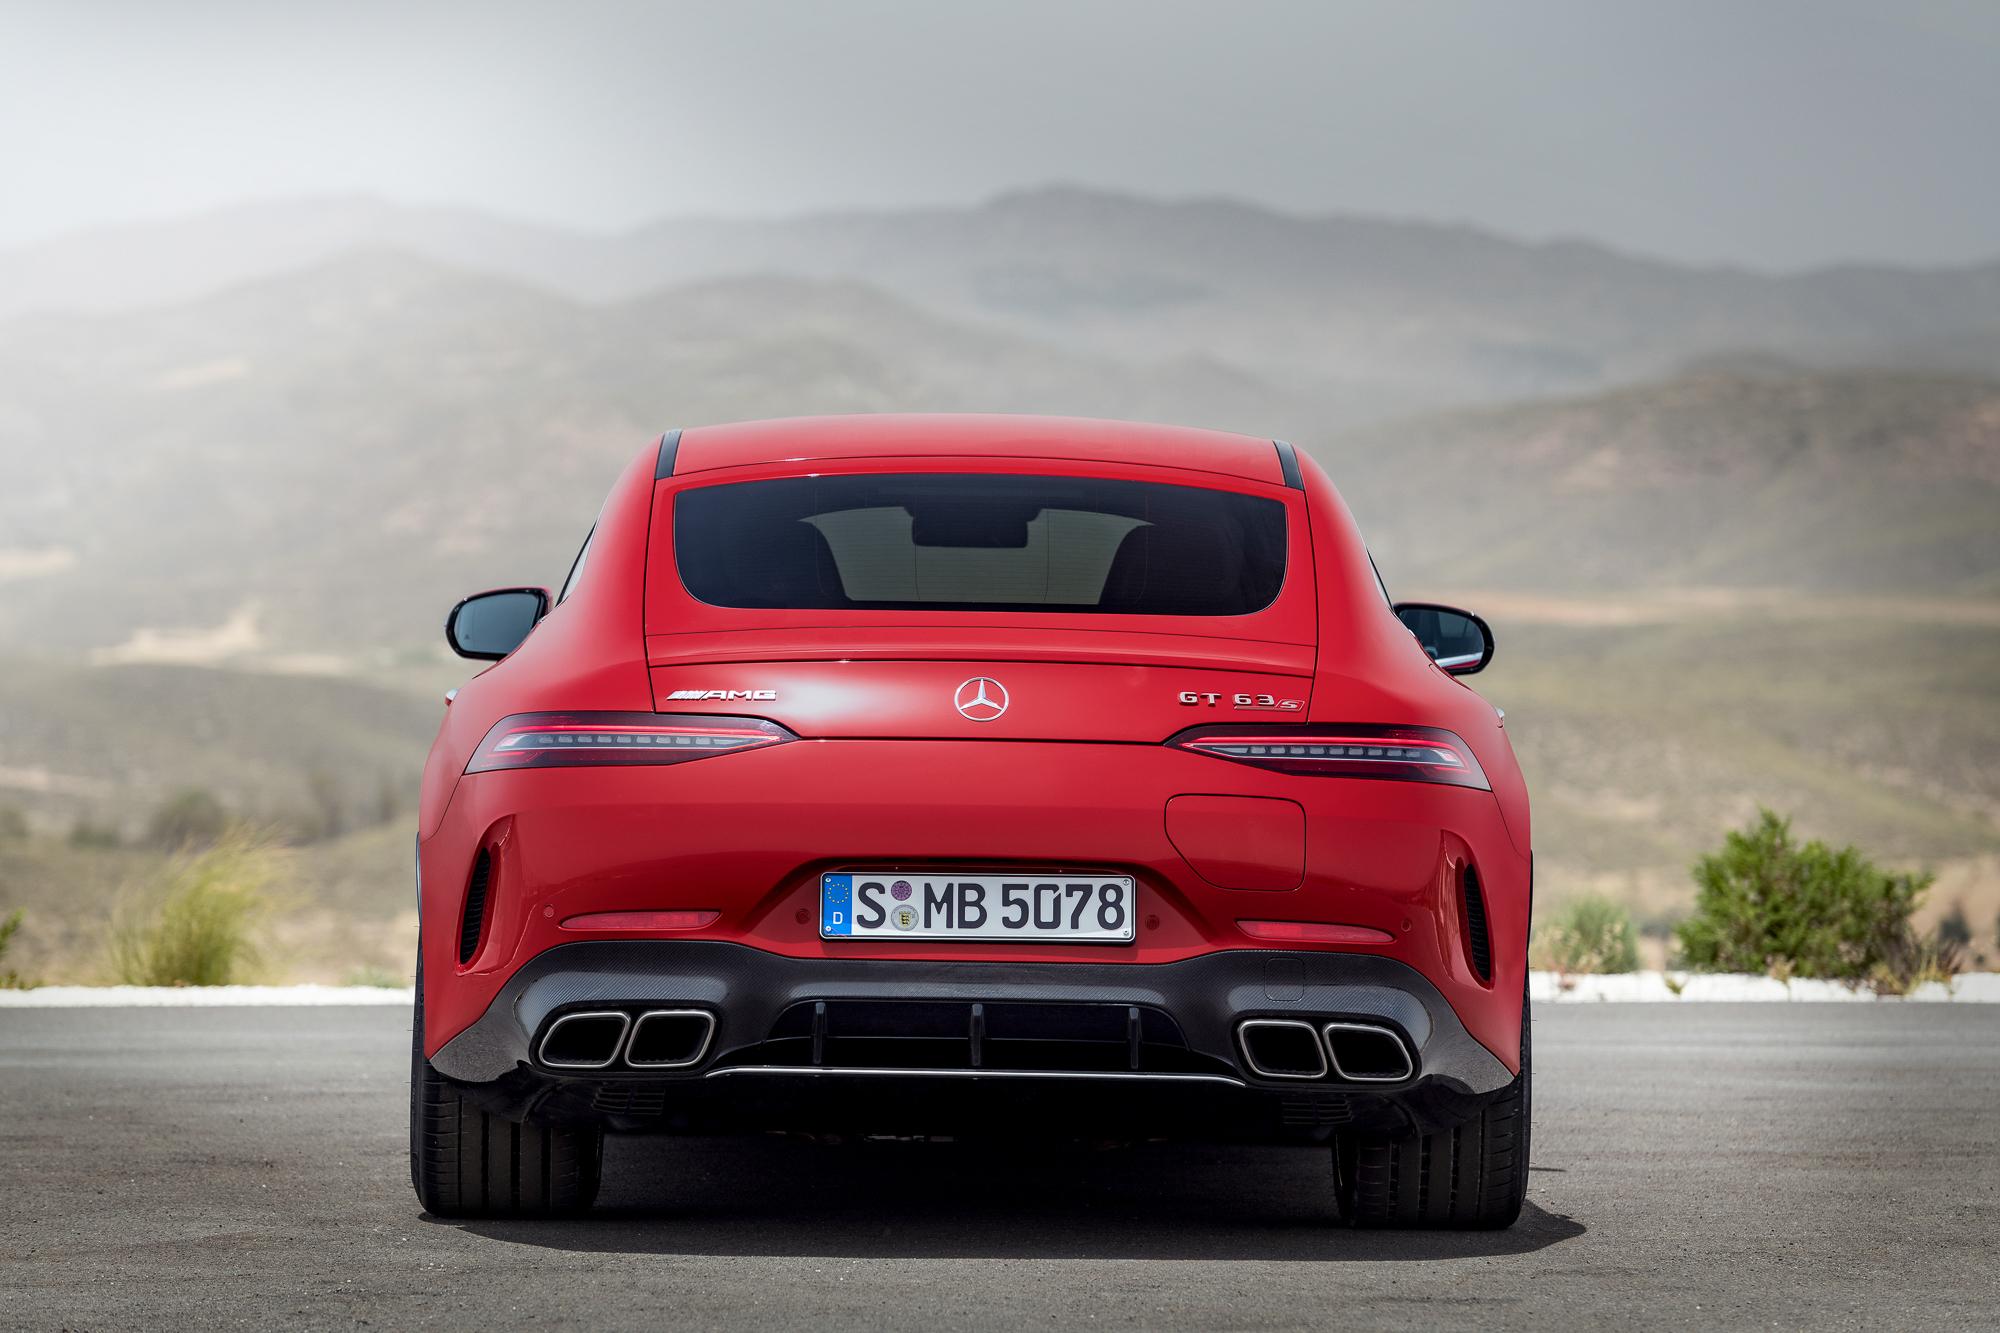 2023-Mercedes-AMG-GT-63-S-E-Performance rear